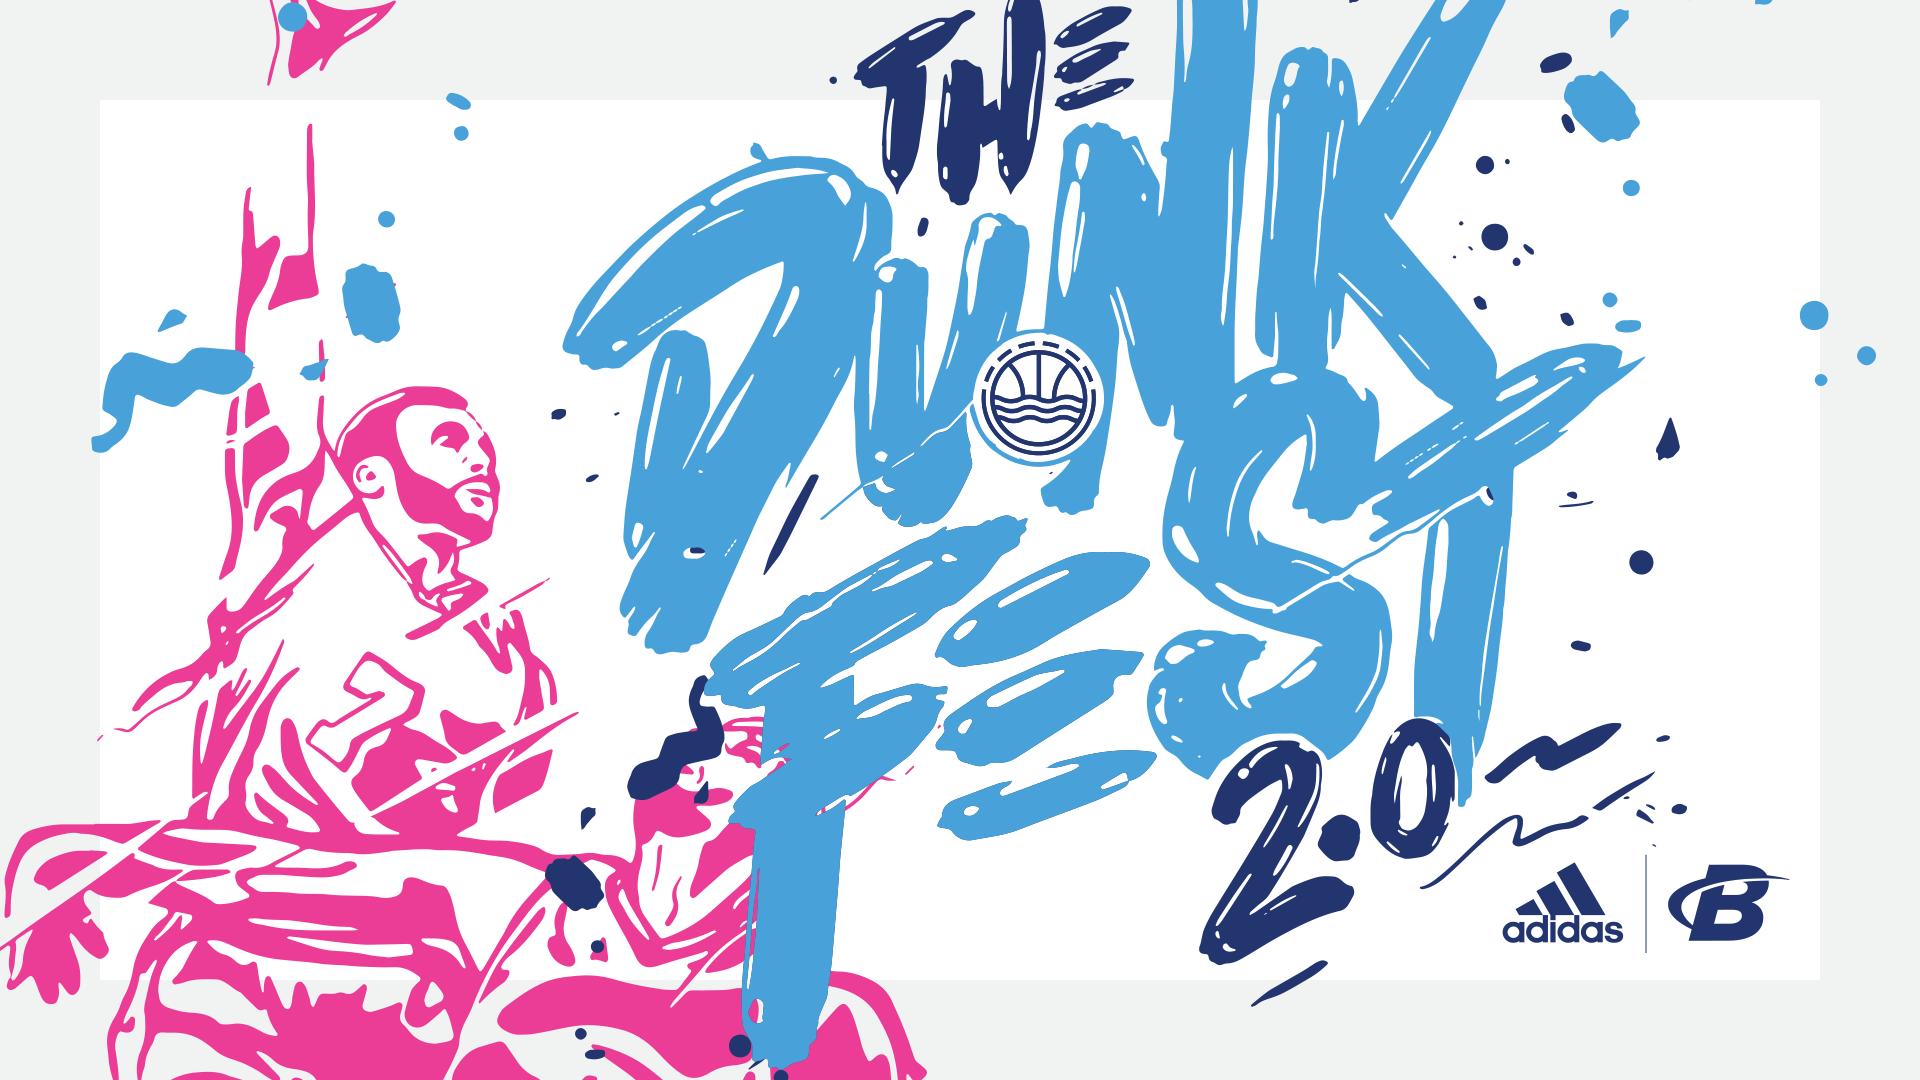 Veniceball presents The DunkFest 2.0